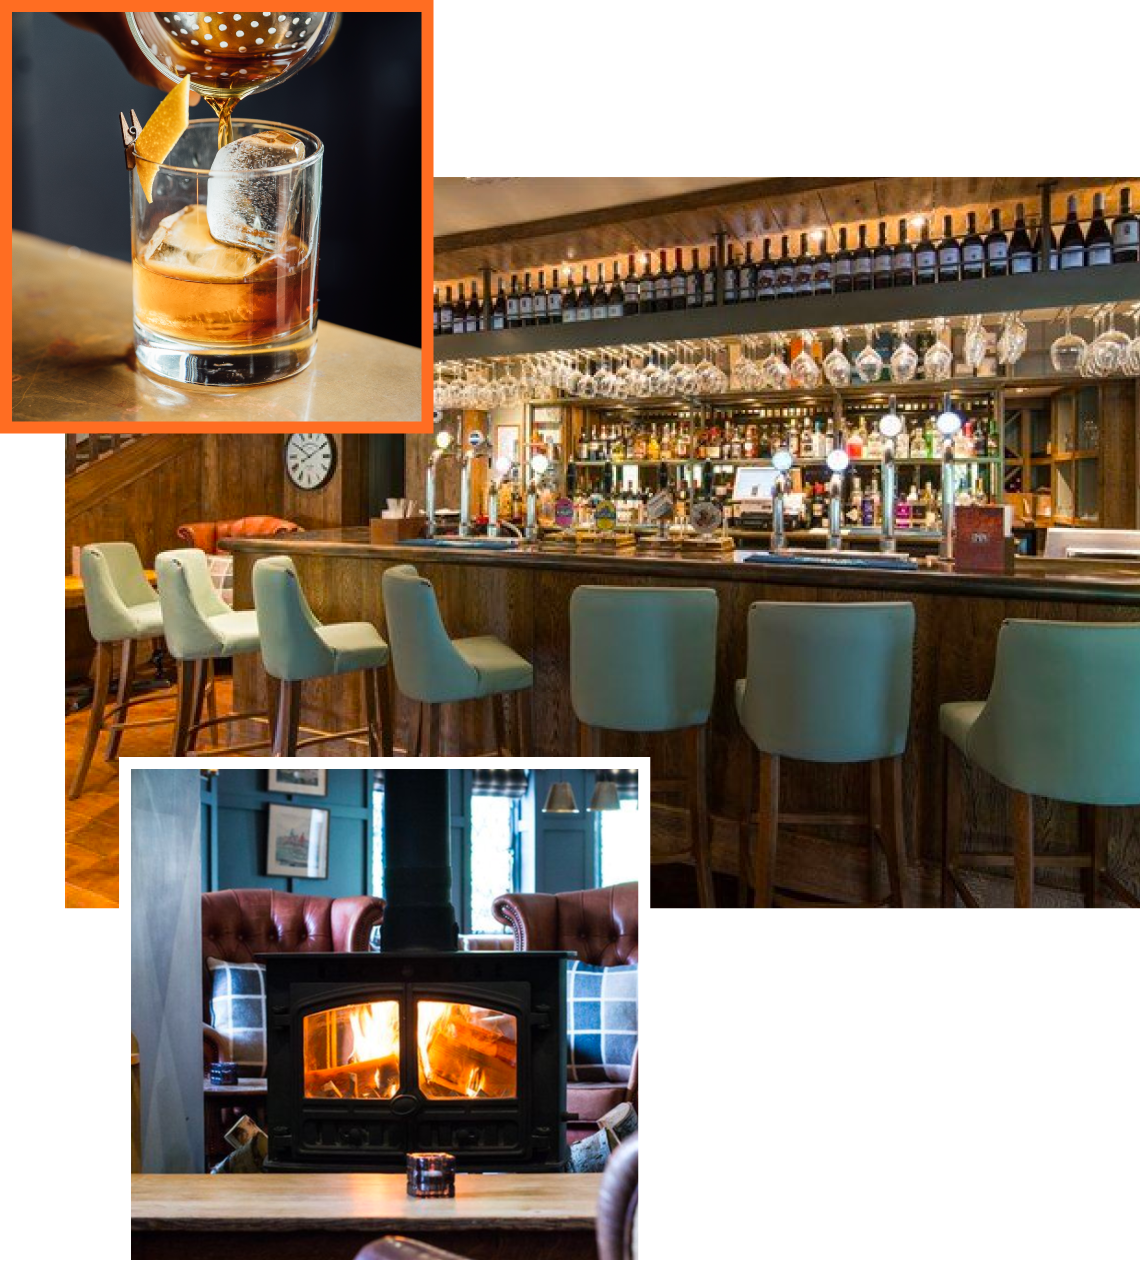 homepage-bar-area-image